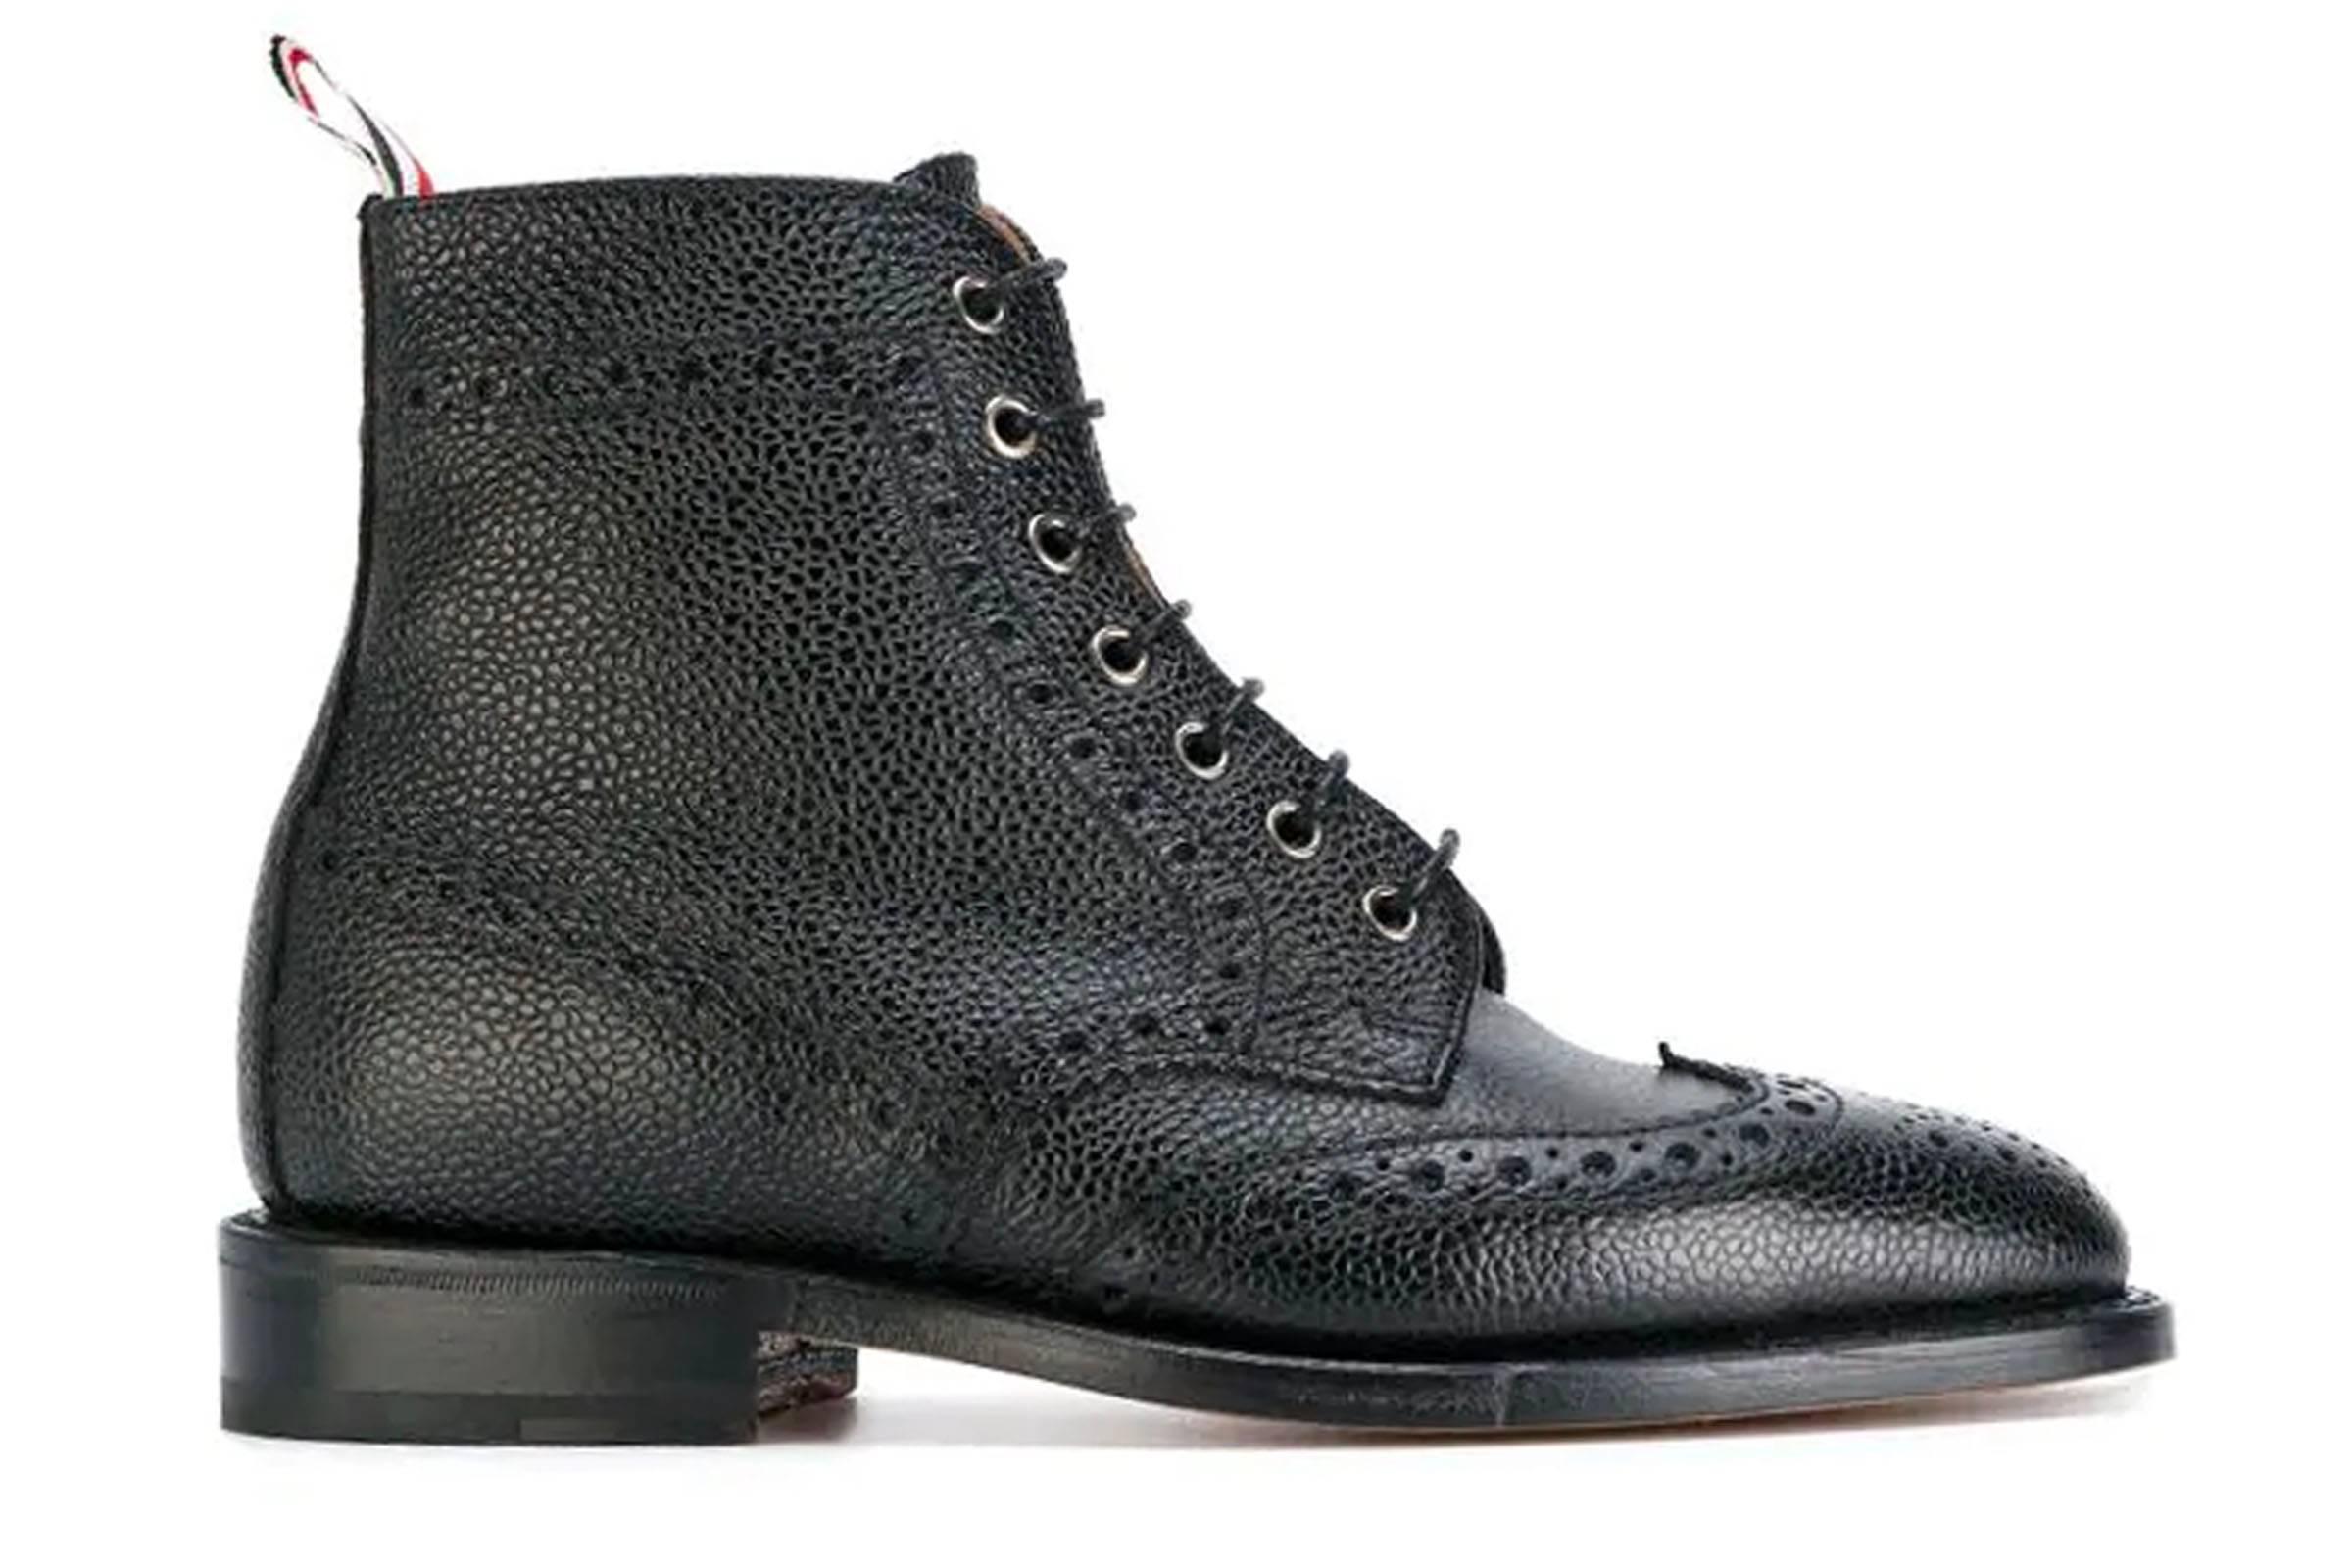 Thom Browne Wingtip Boots